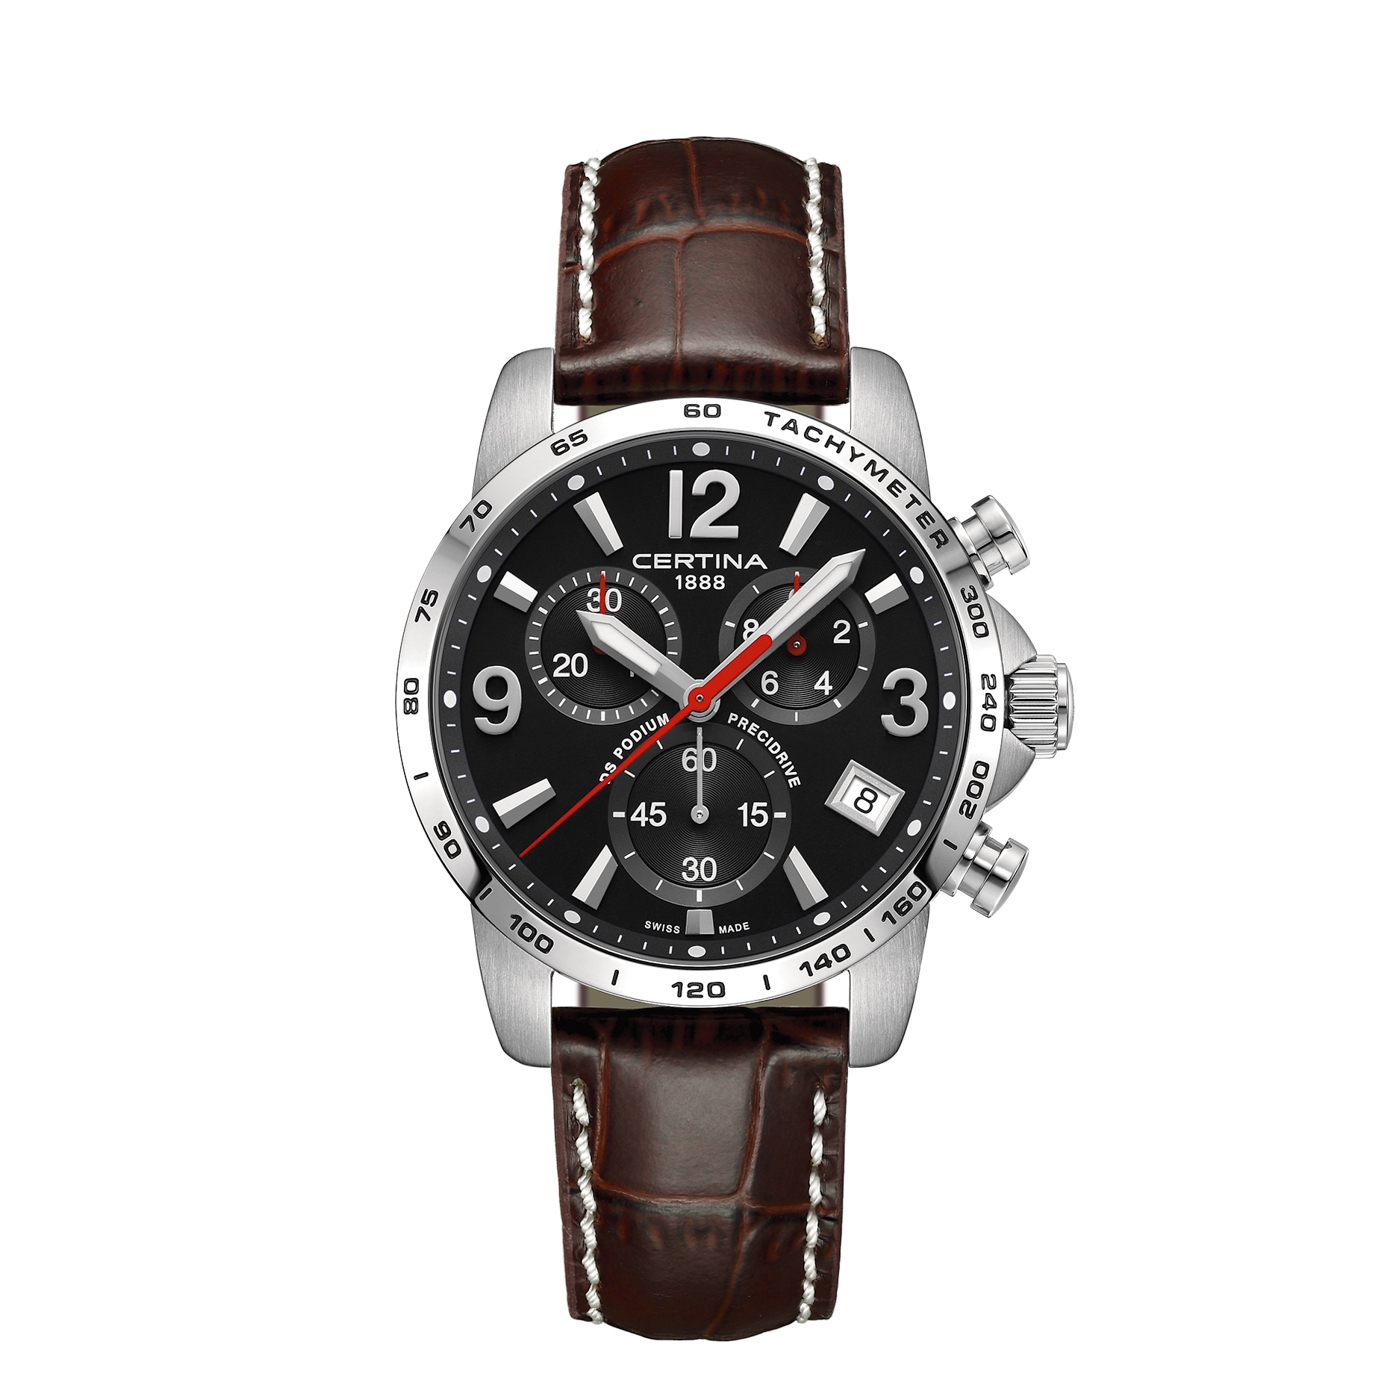 Afbeelding van Certina Sport DS Podium Chrono horloge C0344171605700